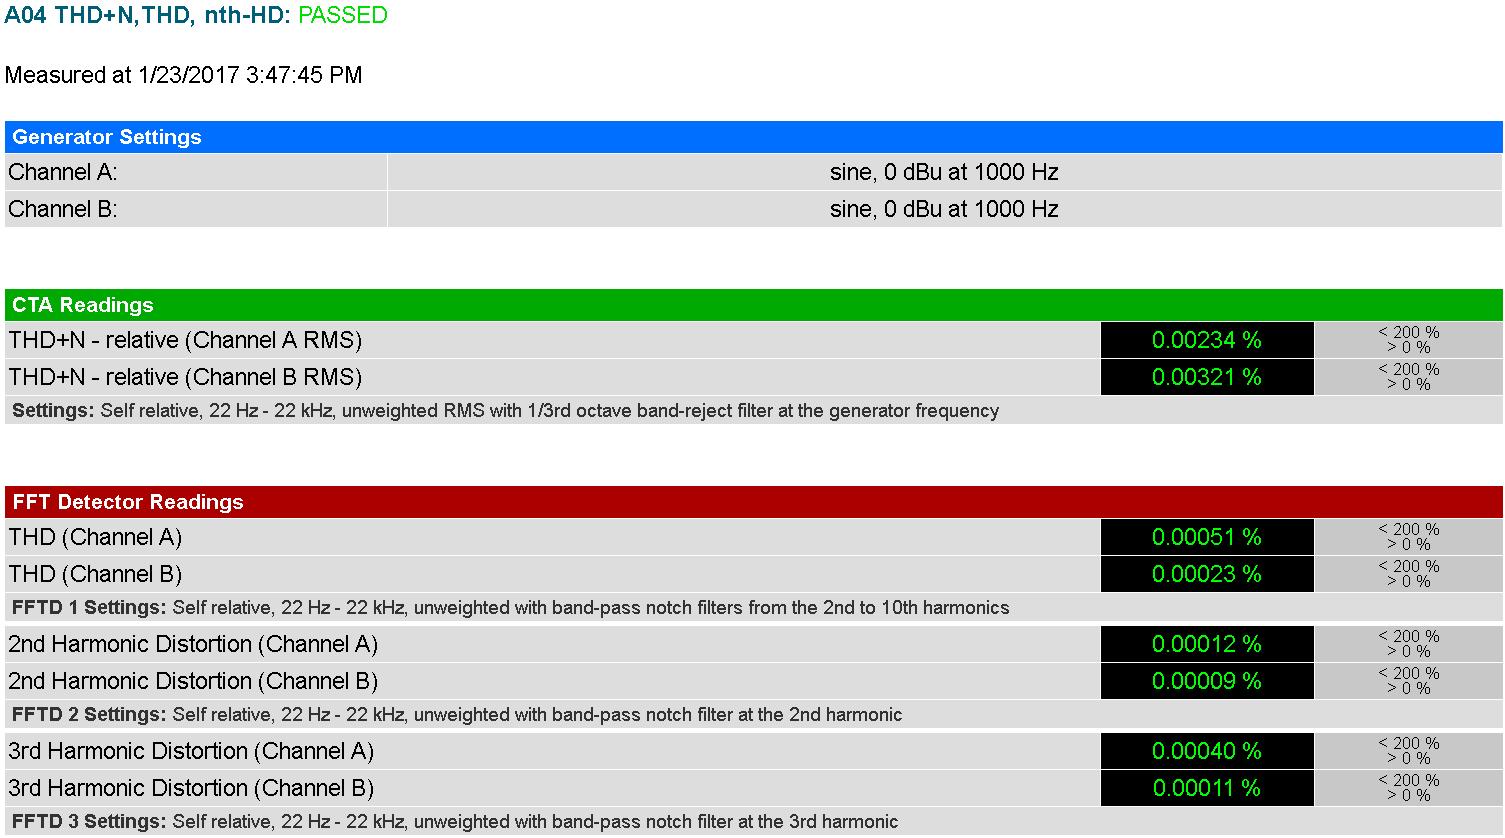 20170123 Saga A04 THD+N  THD  nth-HD 100K load passive.png